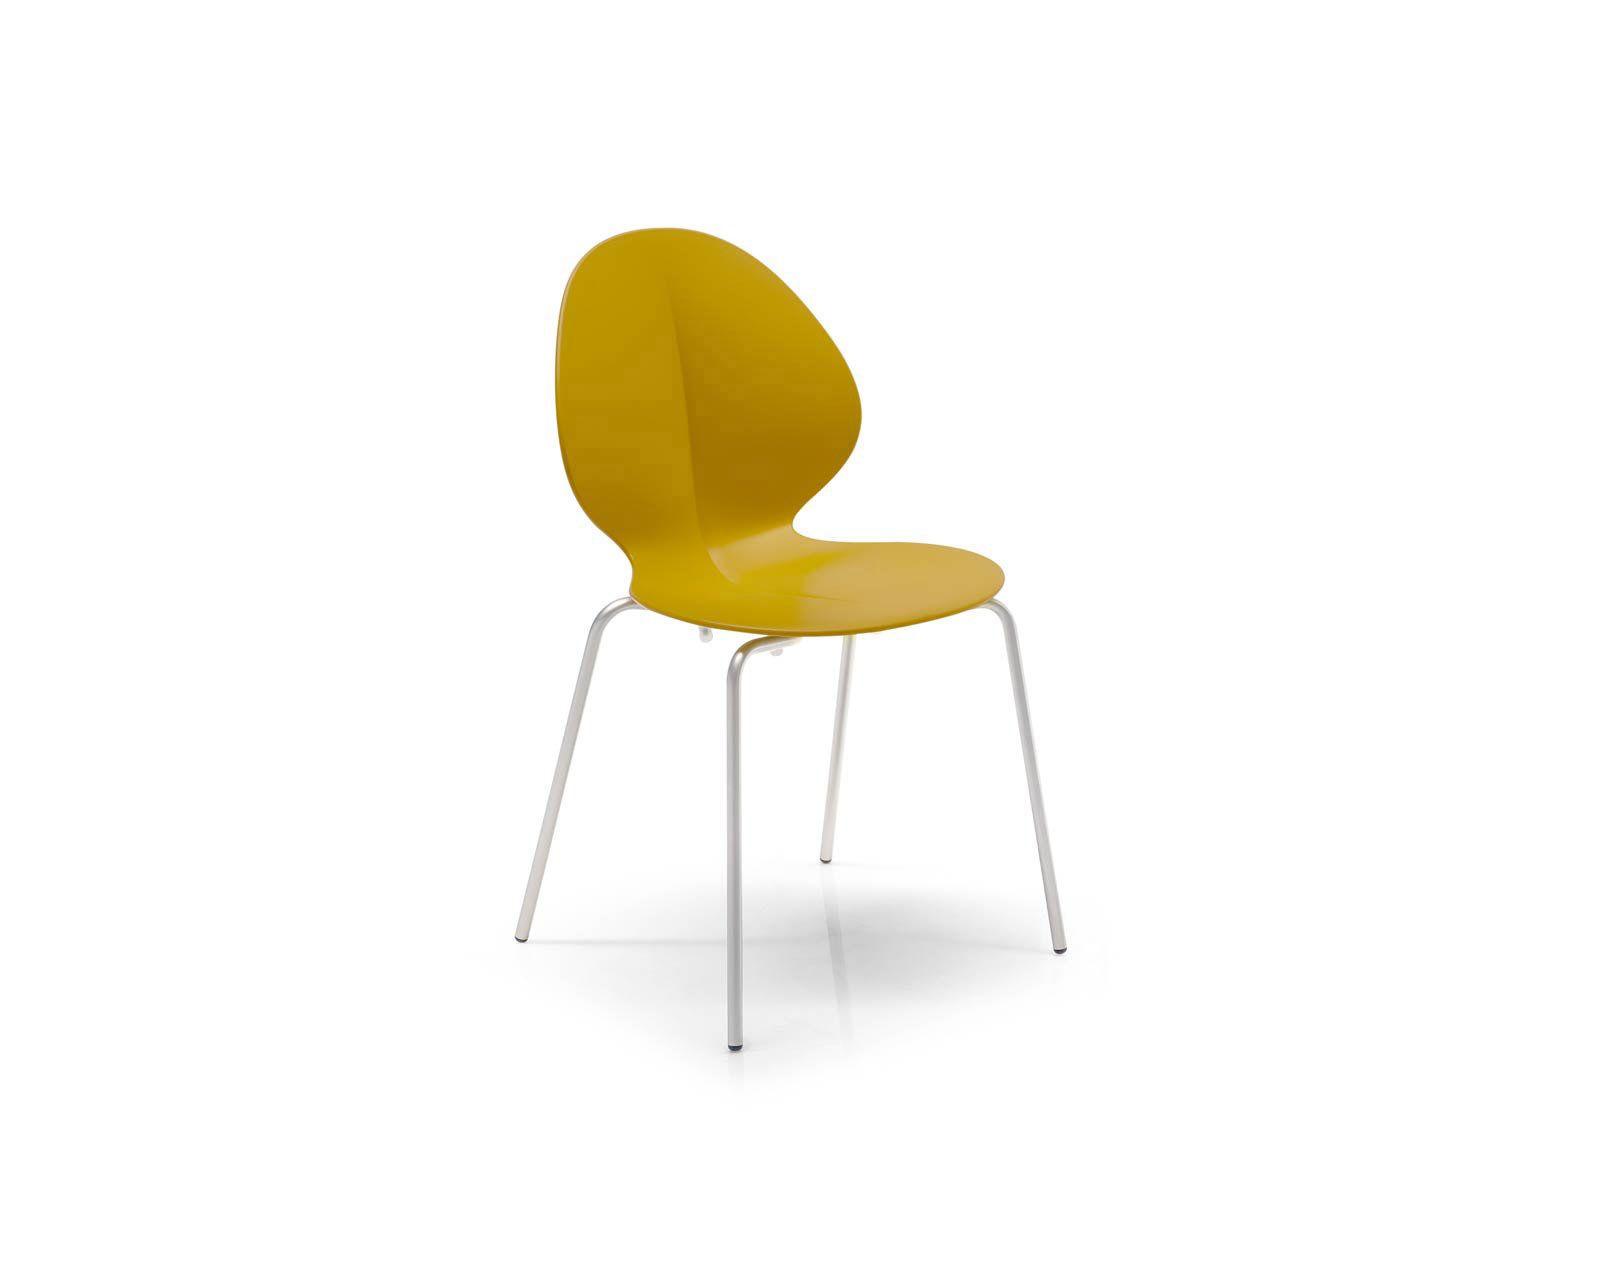 Basil Outdoor Design Chair Calligaris Cs 1359 A Chair Wooden Chair Calligaris